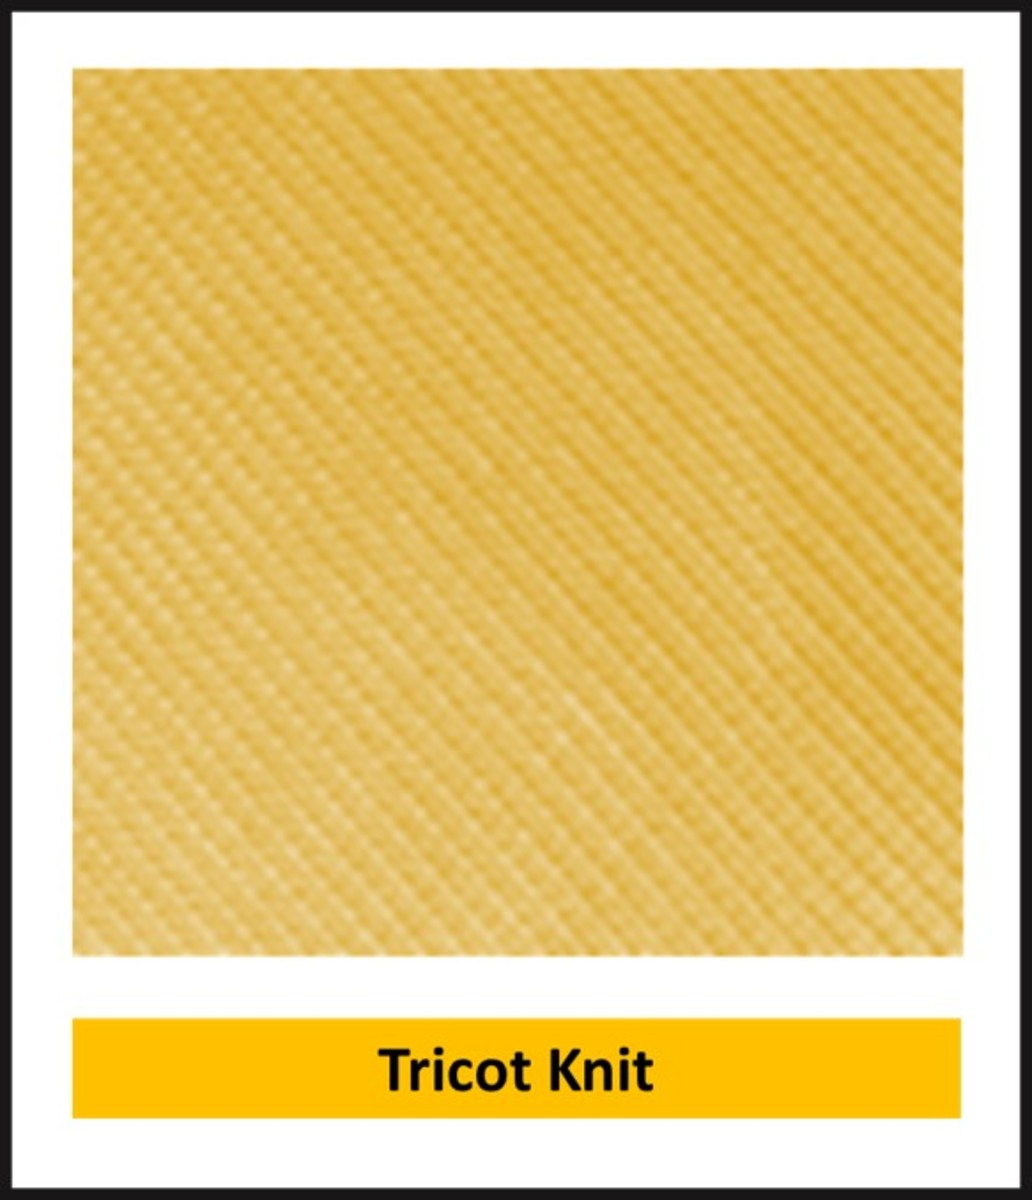 Tricot Knit